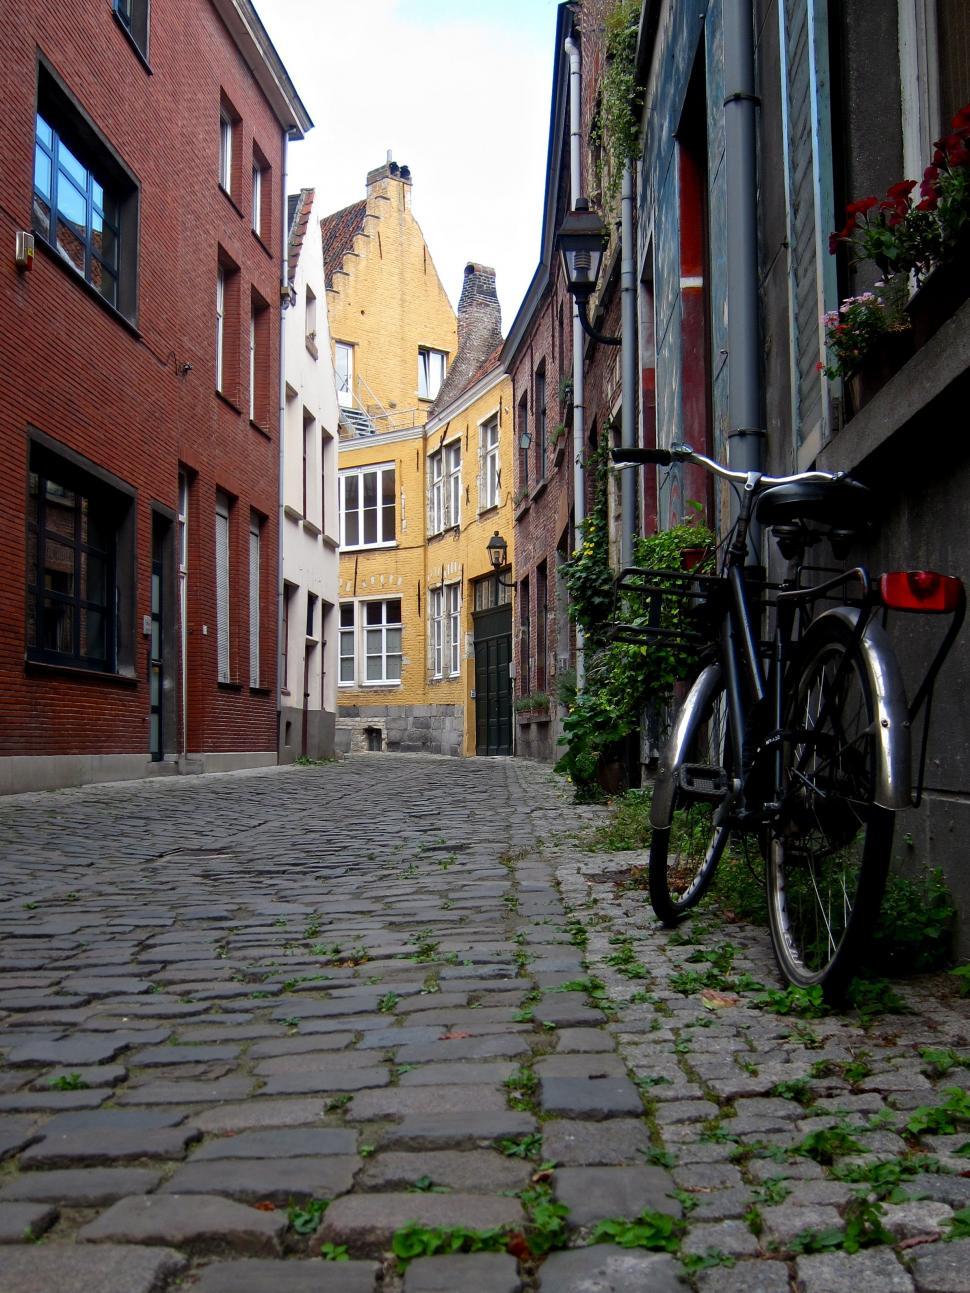 FlandersSummer - Backstreet.jpg